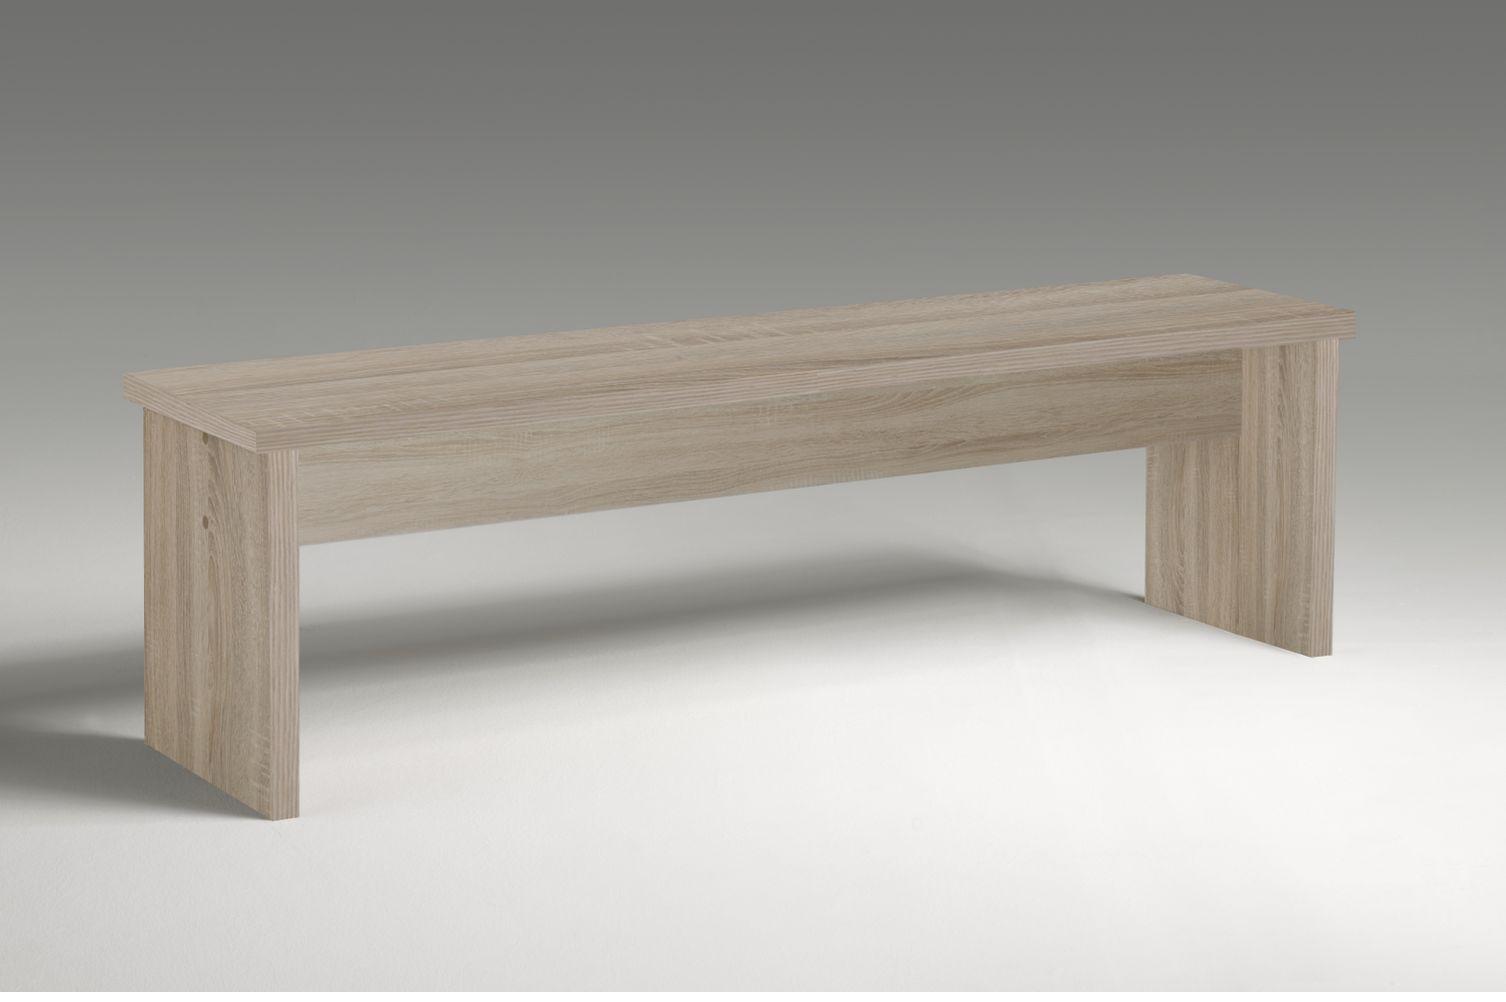 dielenbank esszimmerbank holzbank bank esstischbank. Black Bedroom Furniture Sets. Home Design Ideas